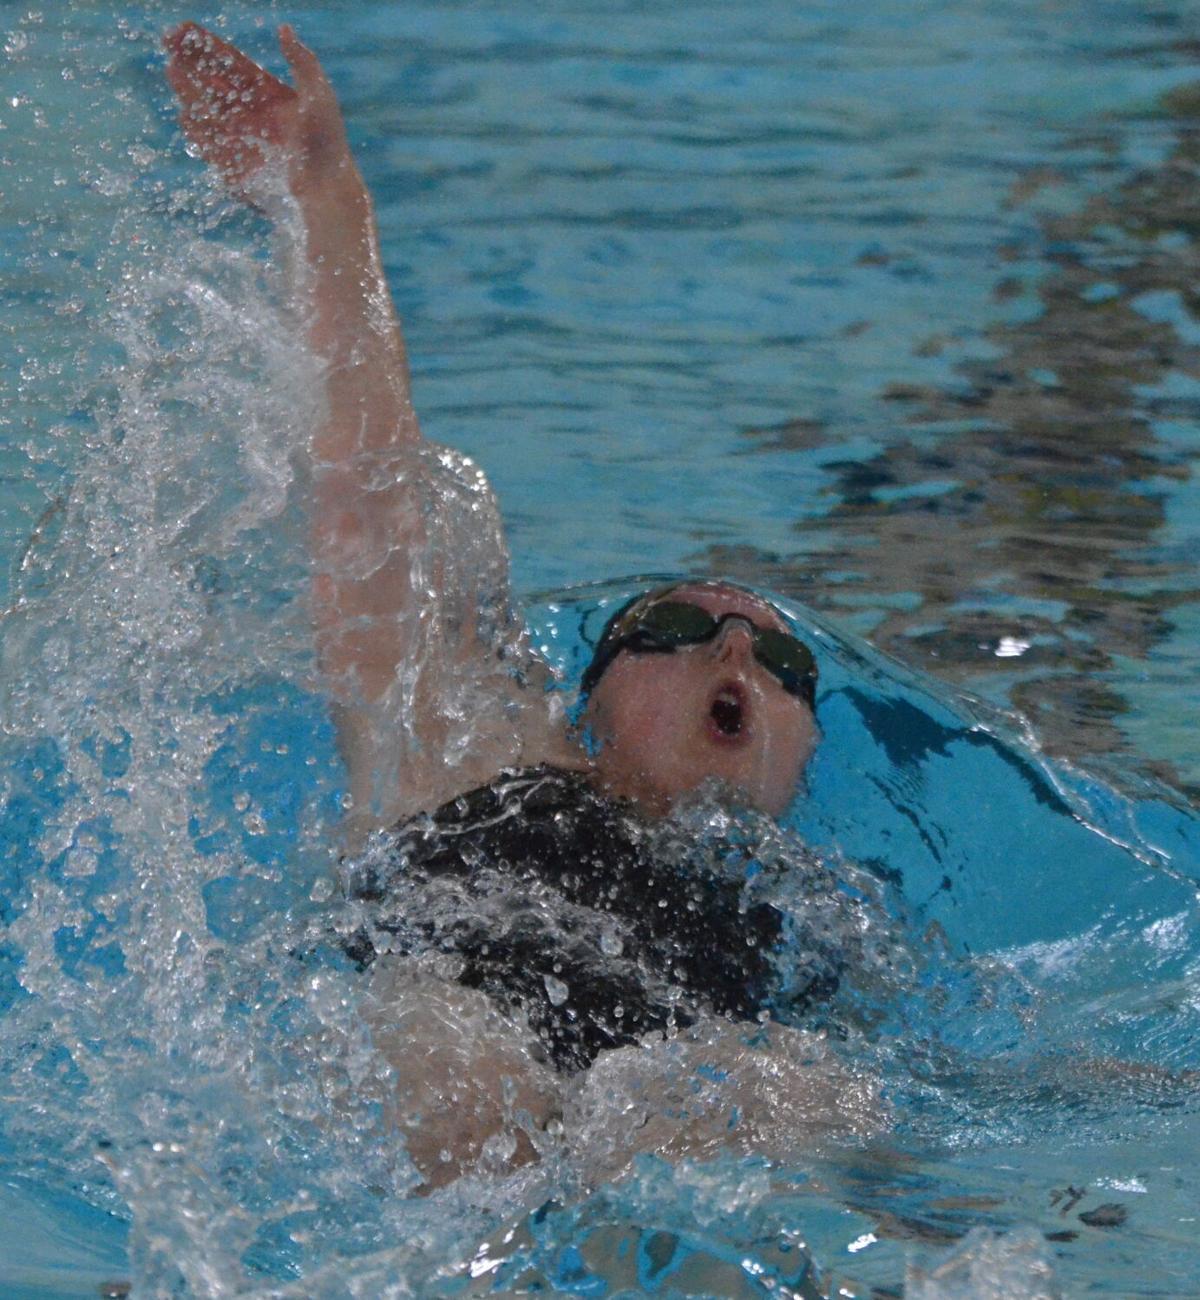 Farrell backstroke